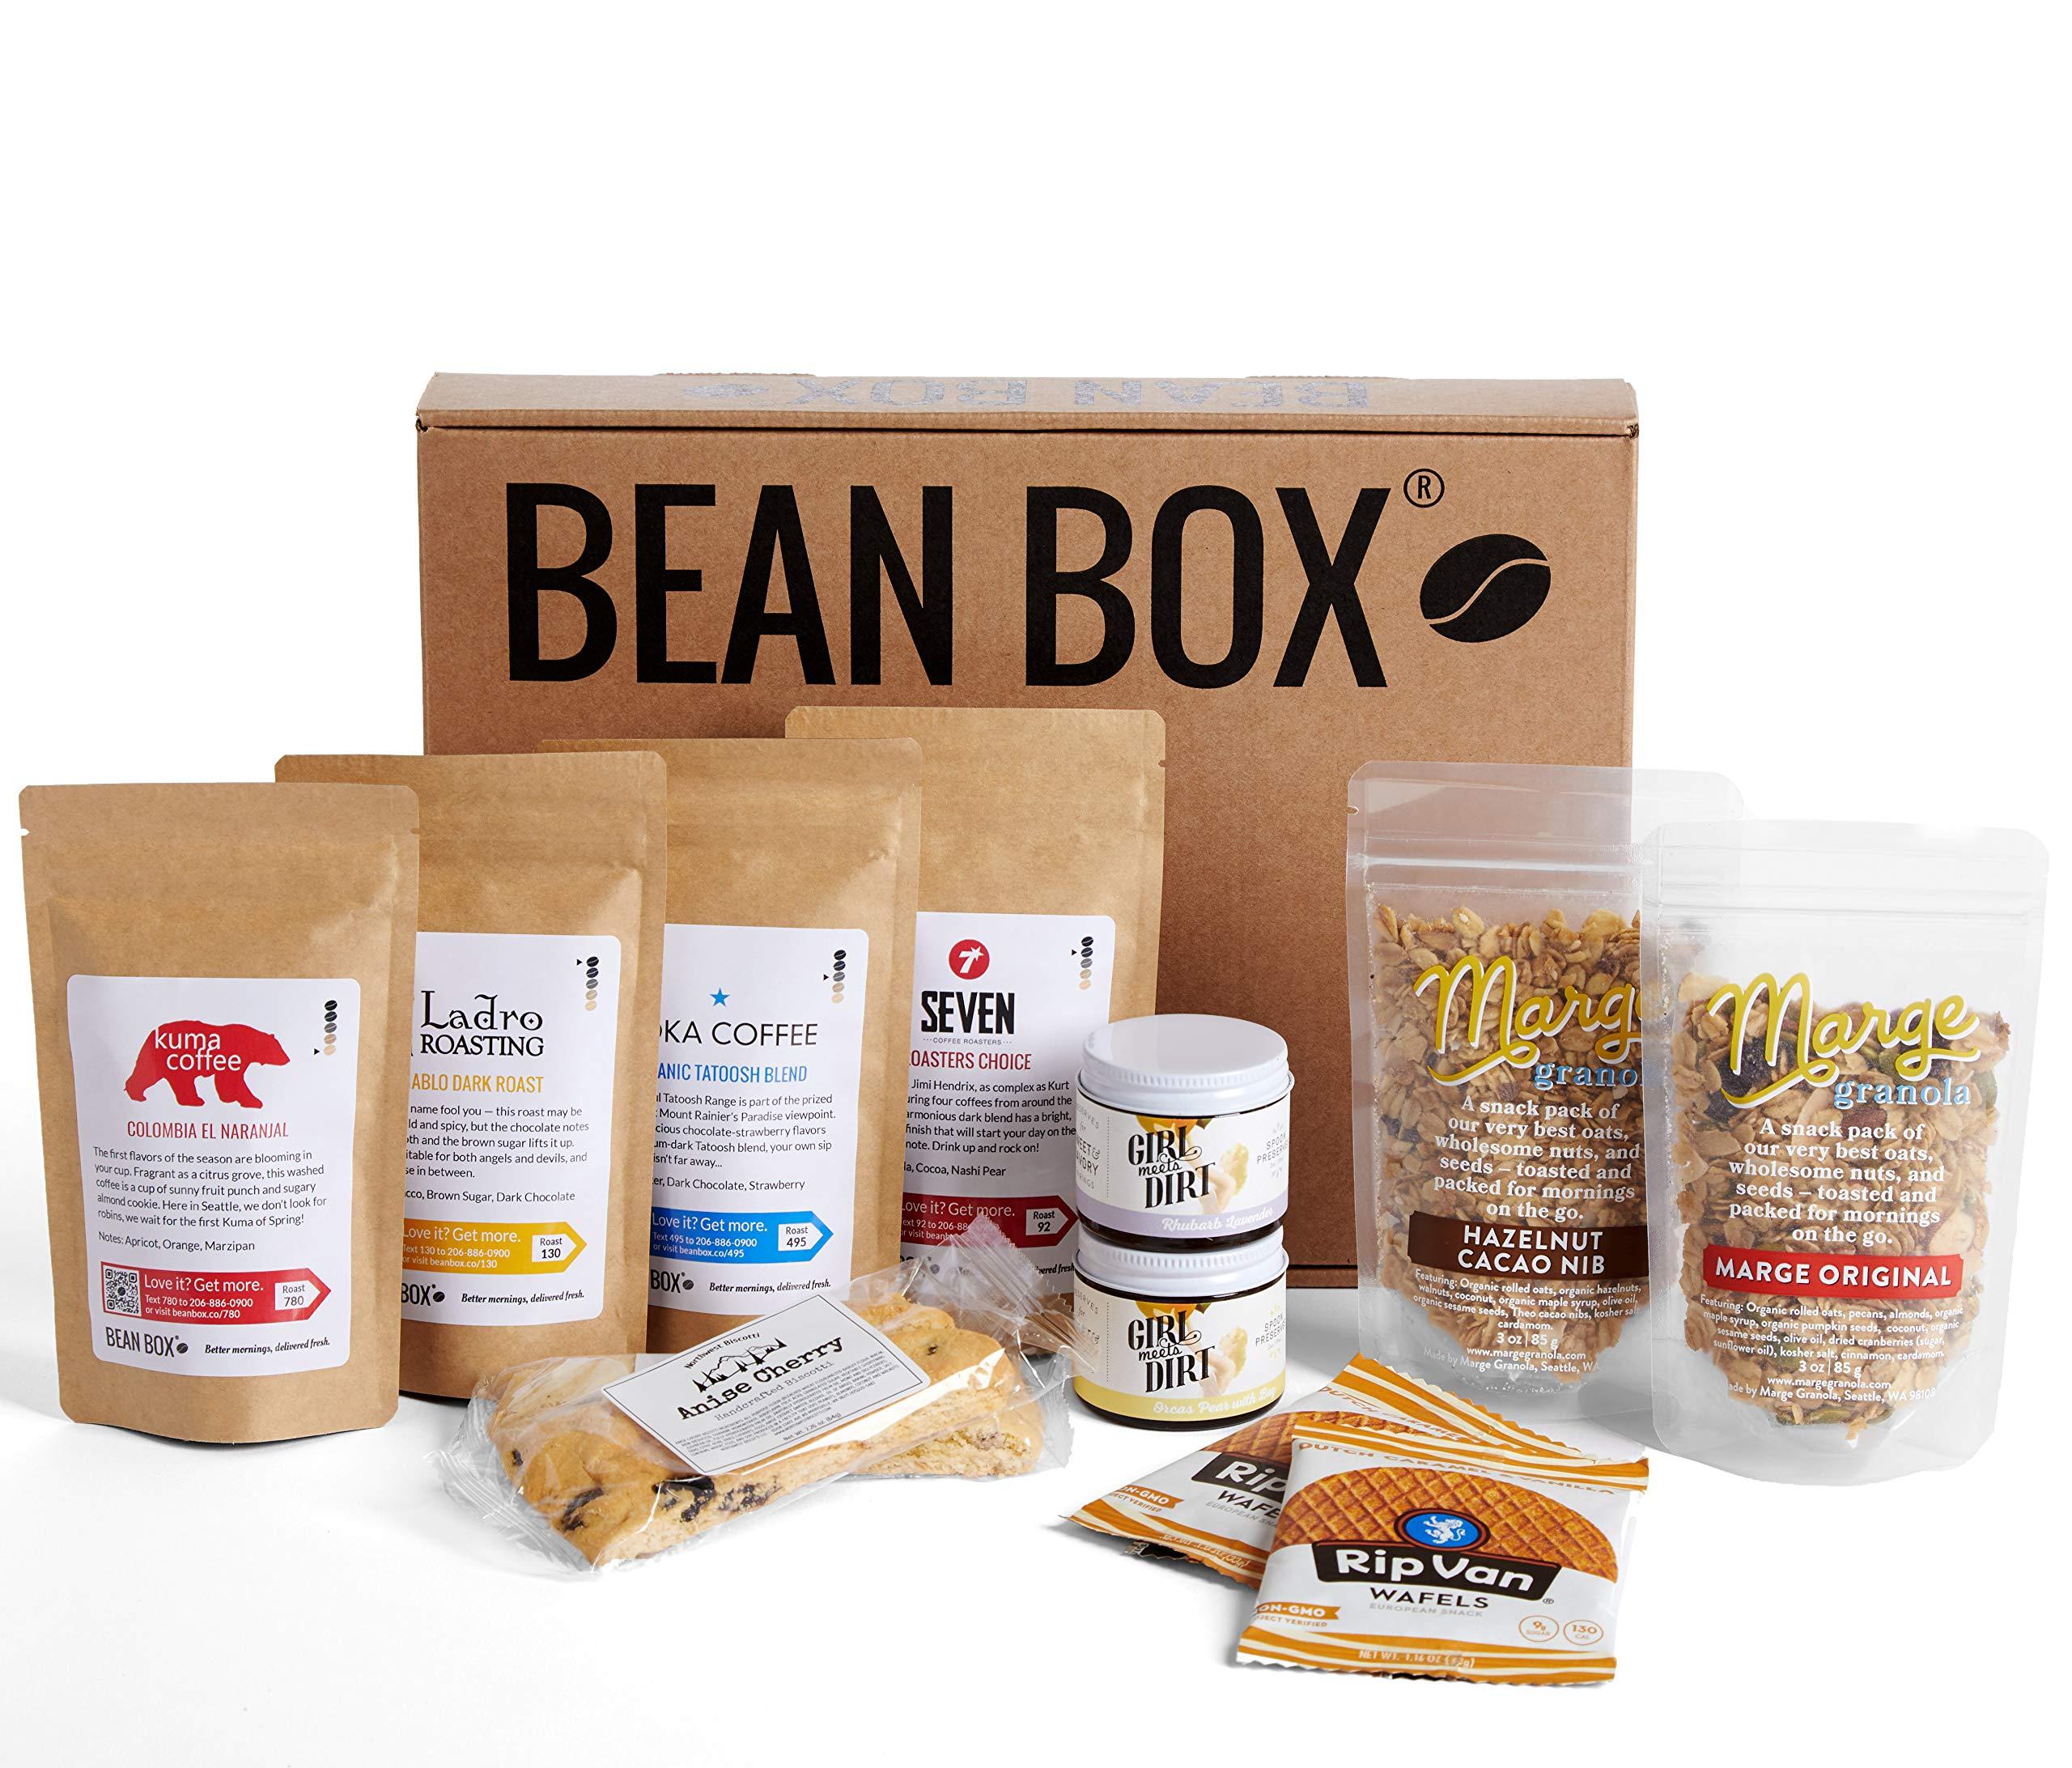 Bean Box - Good Morning Coffee Gift Box